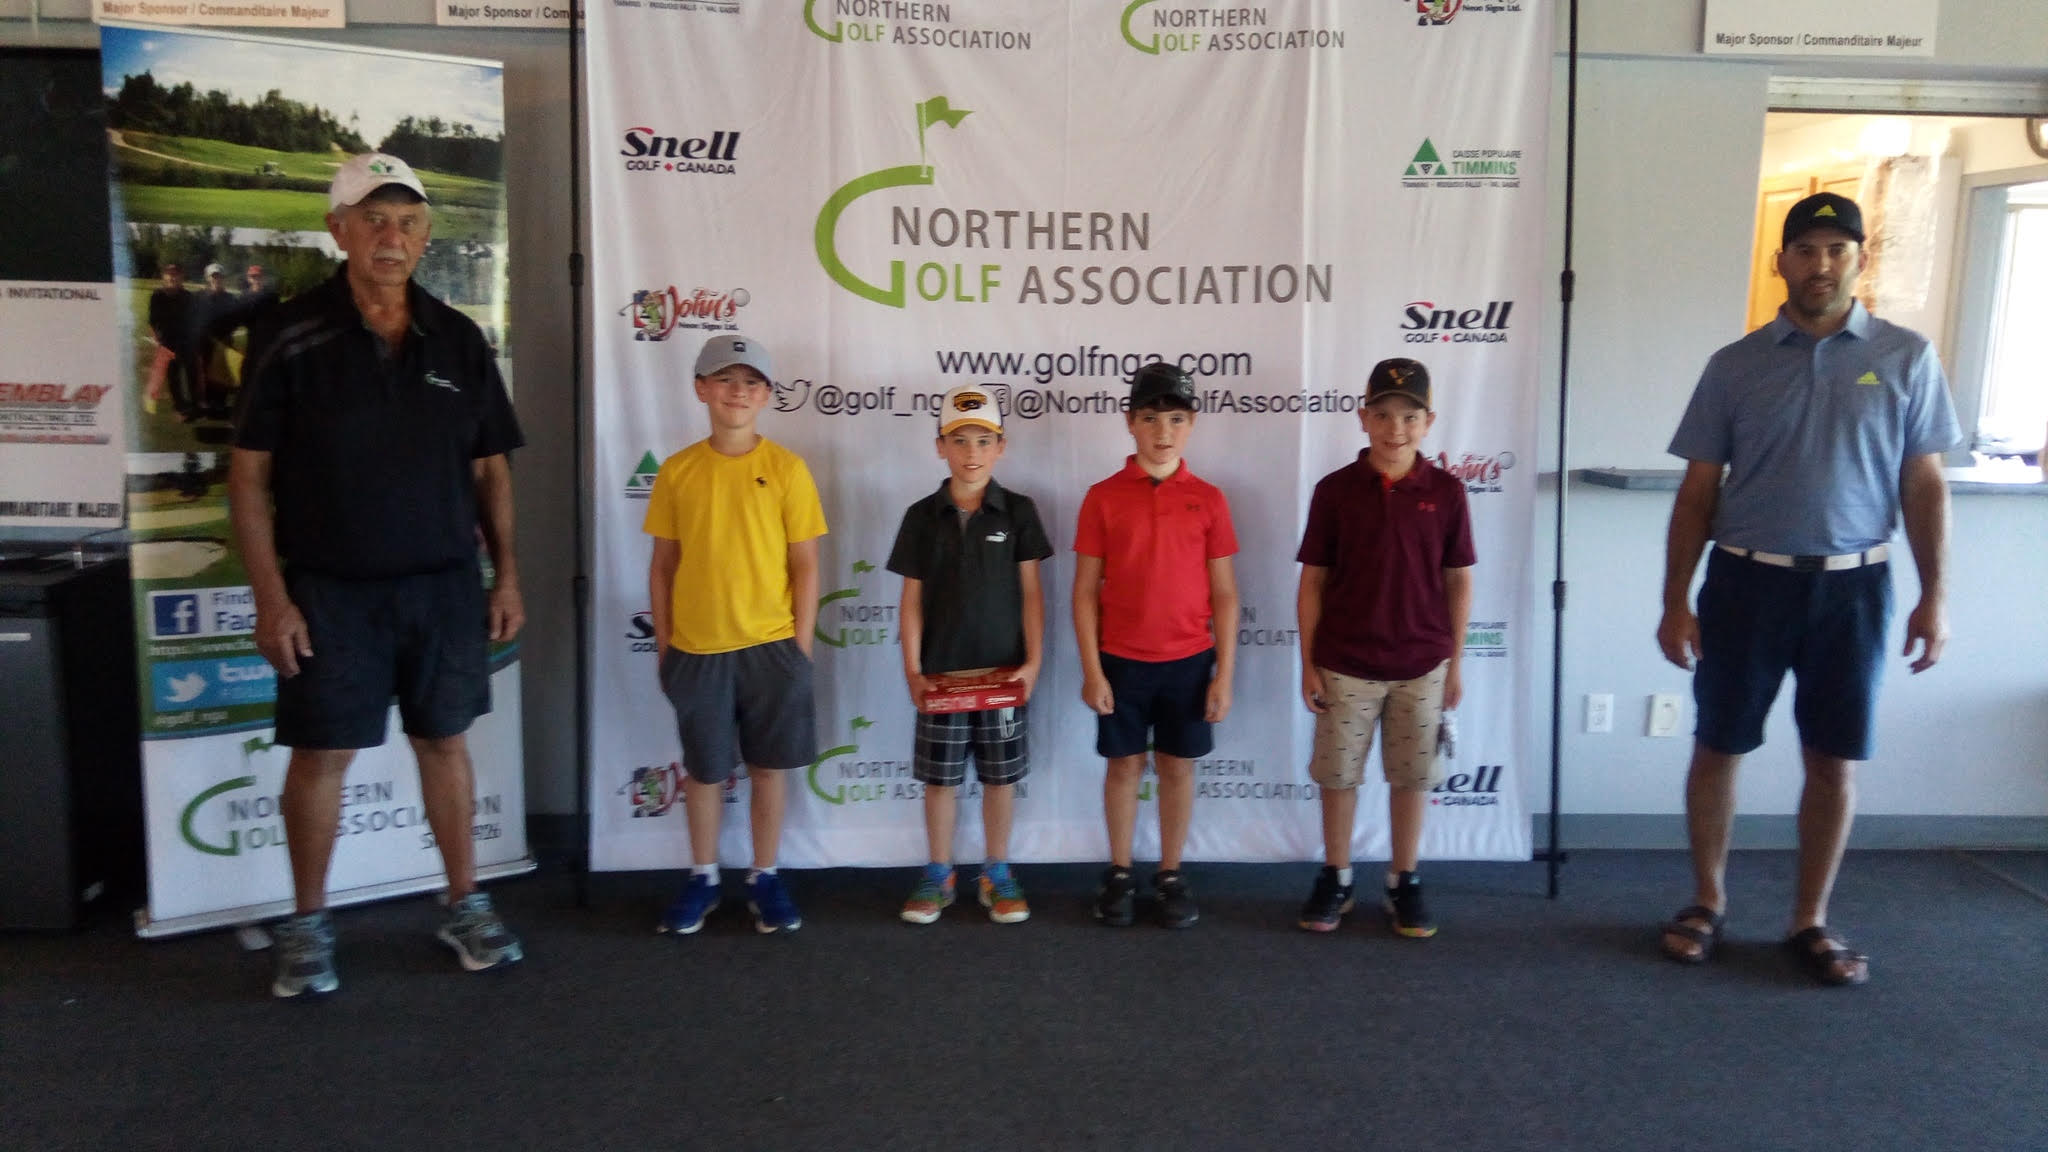 Brody Guenette, Matéo Villeneuve, Alexandre Duhaime, Bryson Dube competed as a scramble team at the NGA Junior Championships